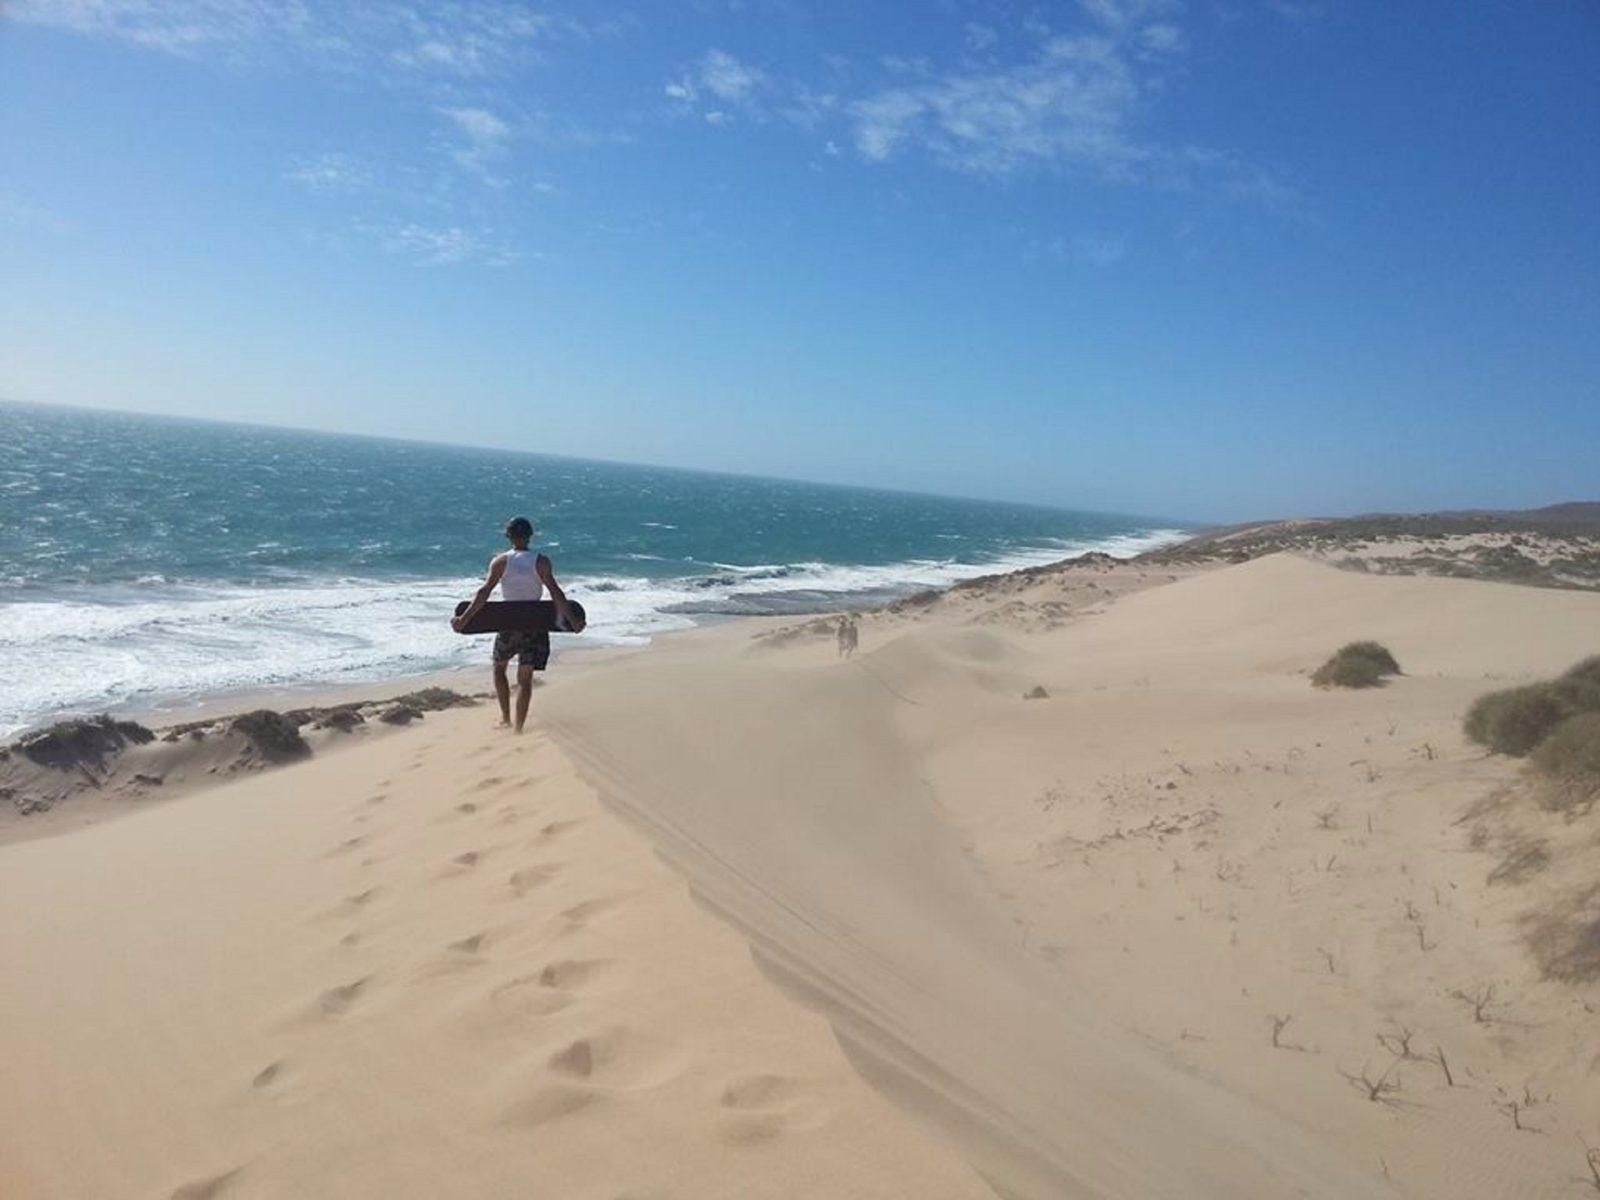 Kalbarri Sandboarding, Kalbarri, Western Australia